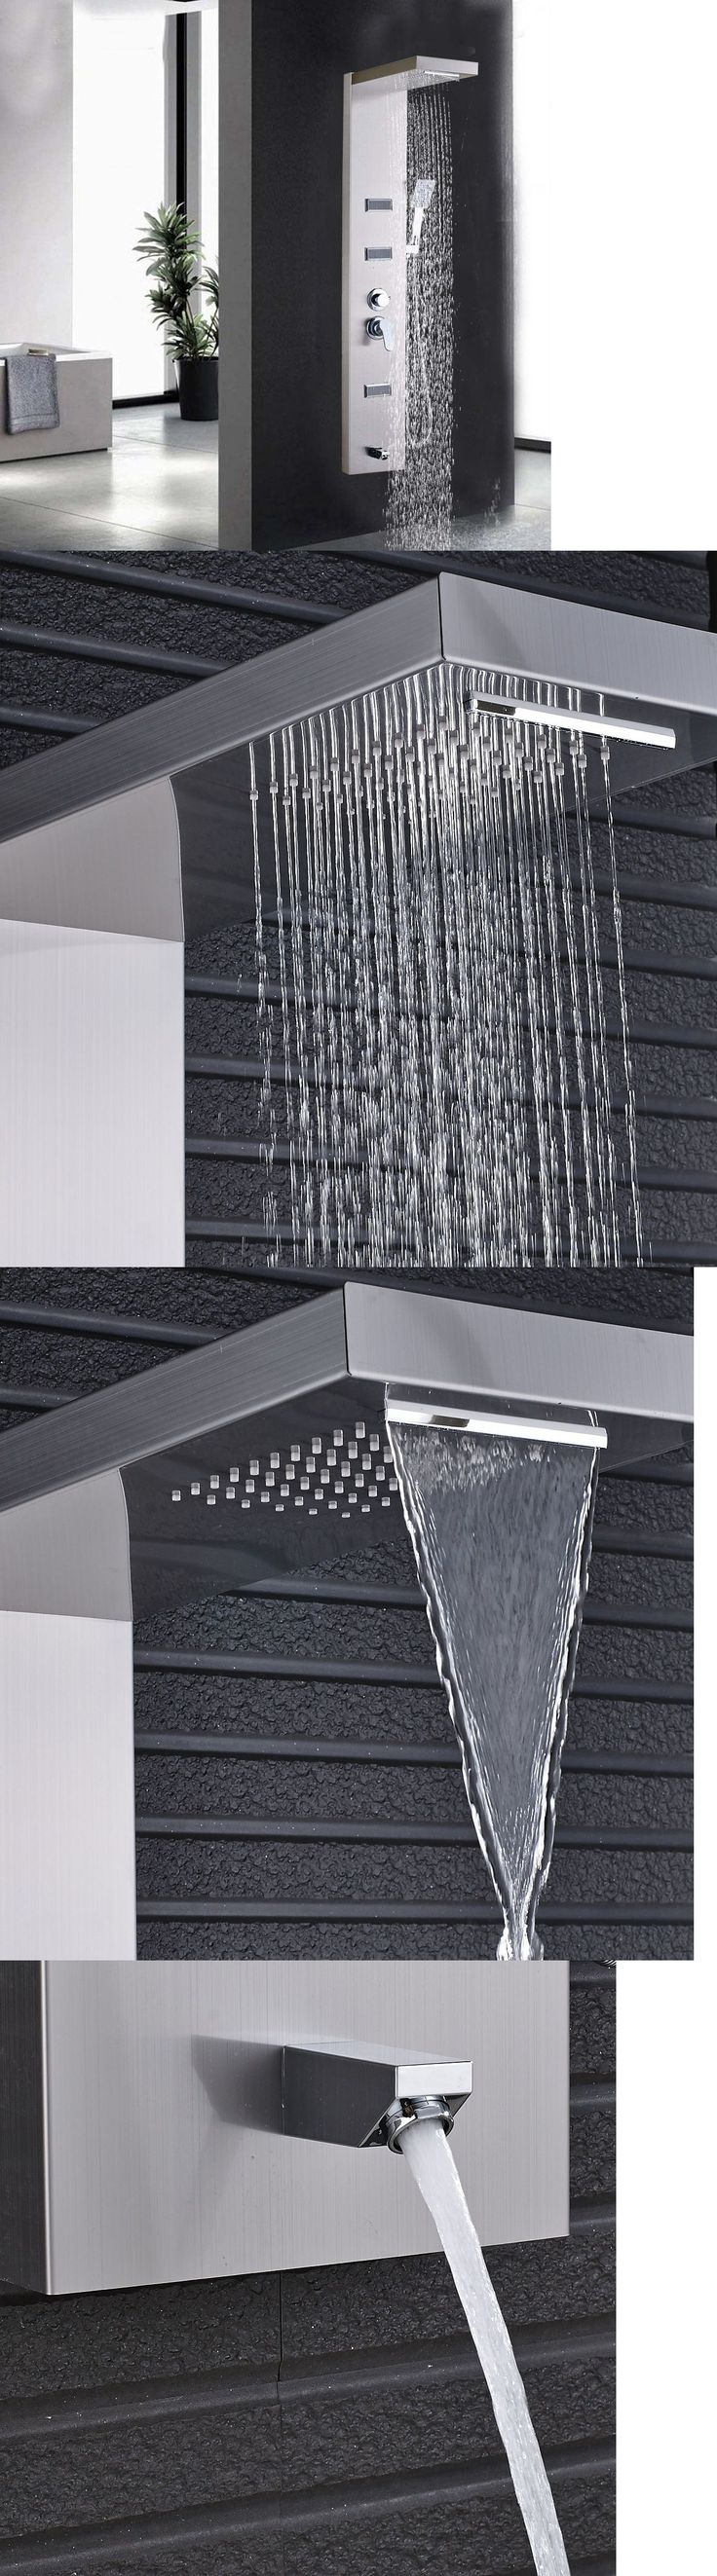 Massagers: Brushed Nickel Shower Panel Column Massage Jets Sprayer Modern Square Shower Tub -> BUY IT NOW ONLY: $87.75 on eBay!